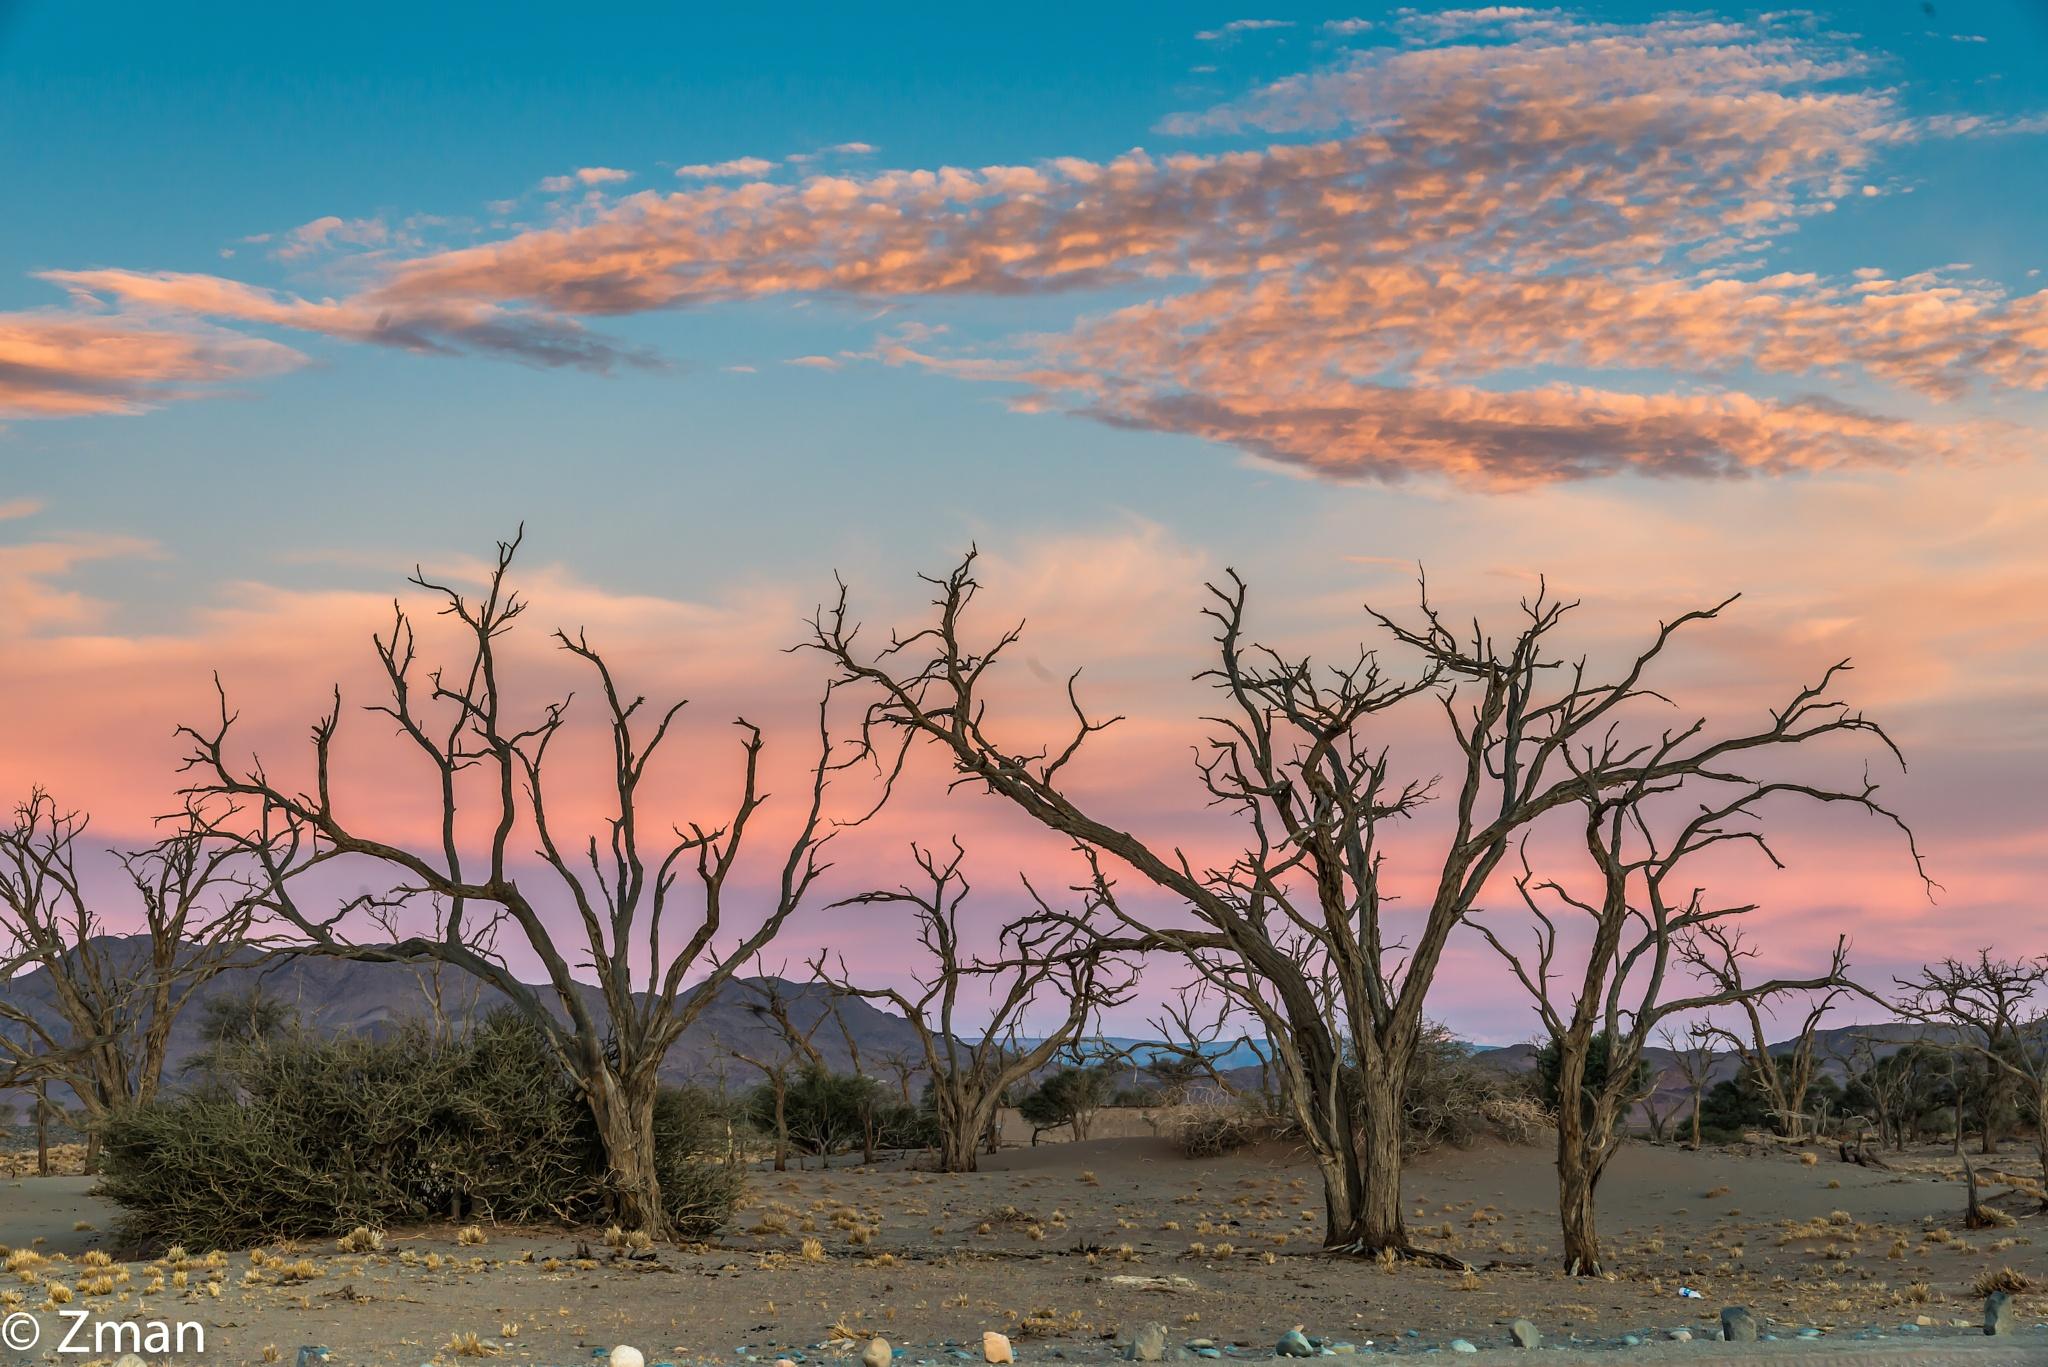 Acacia Trees at Sunset 02 by muhammad.nasser.963